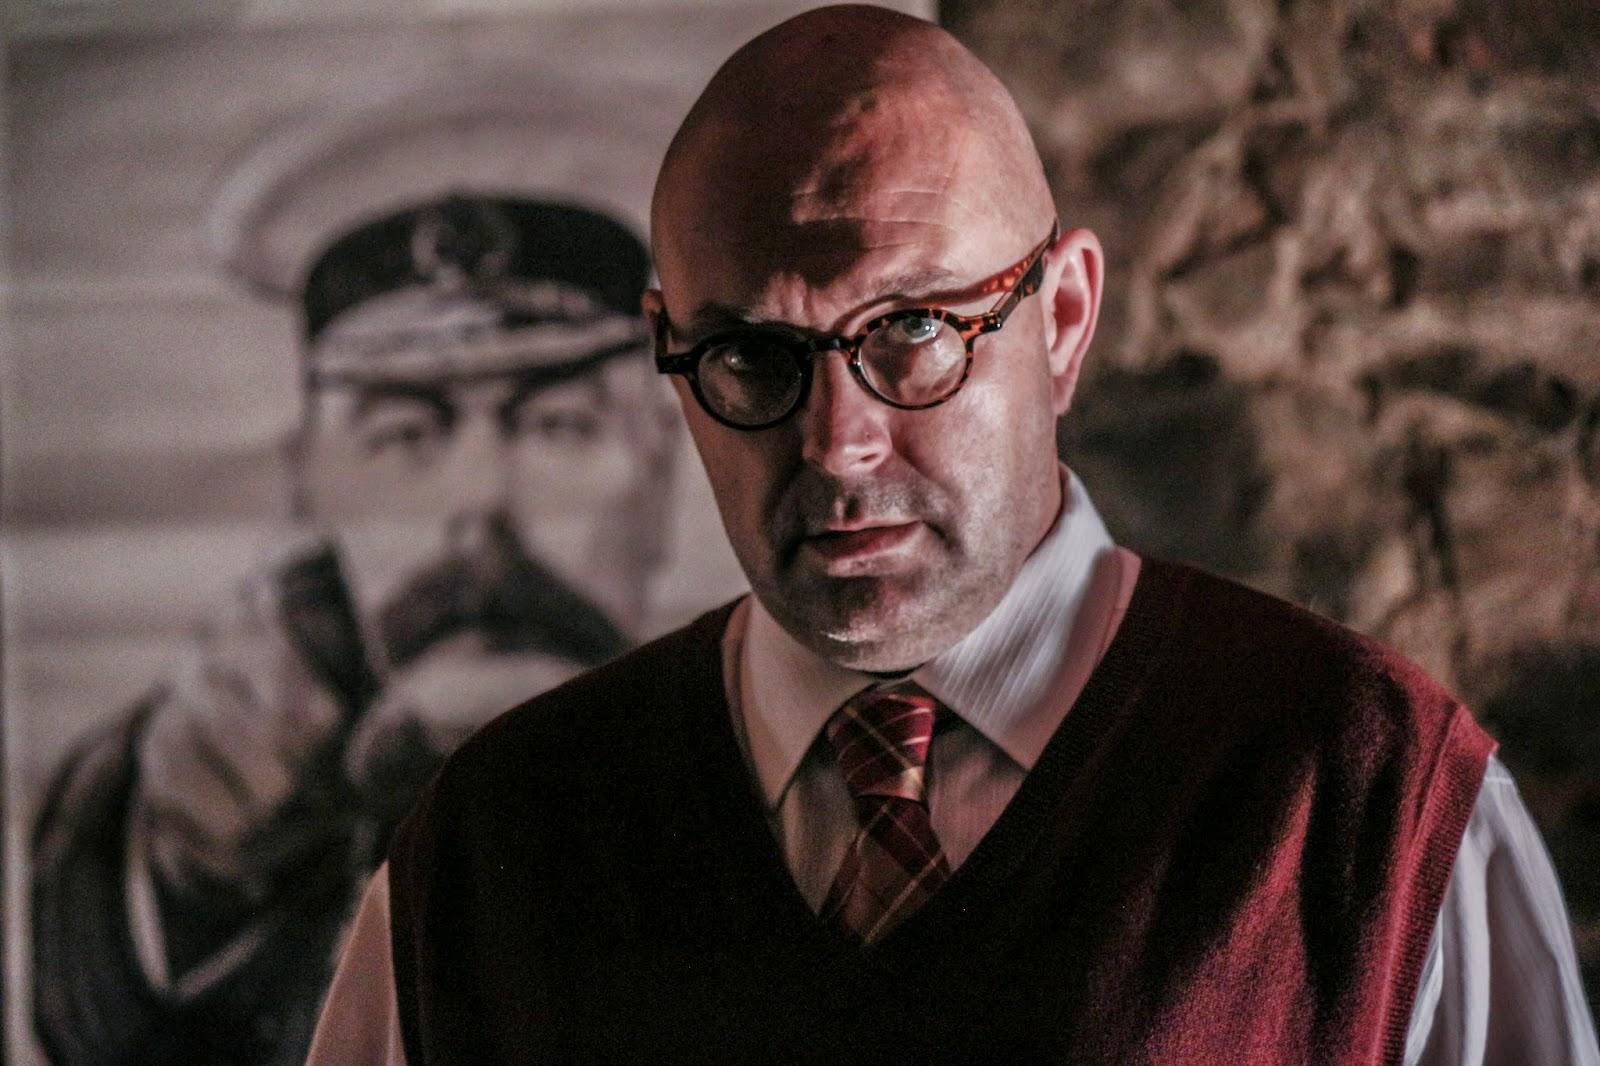 Midge Mullin as John Christie in Howard Brenton's Christie In Love - Substance and shadow theatre - photo by Benjamin Akira Tallamy